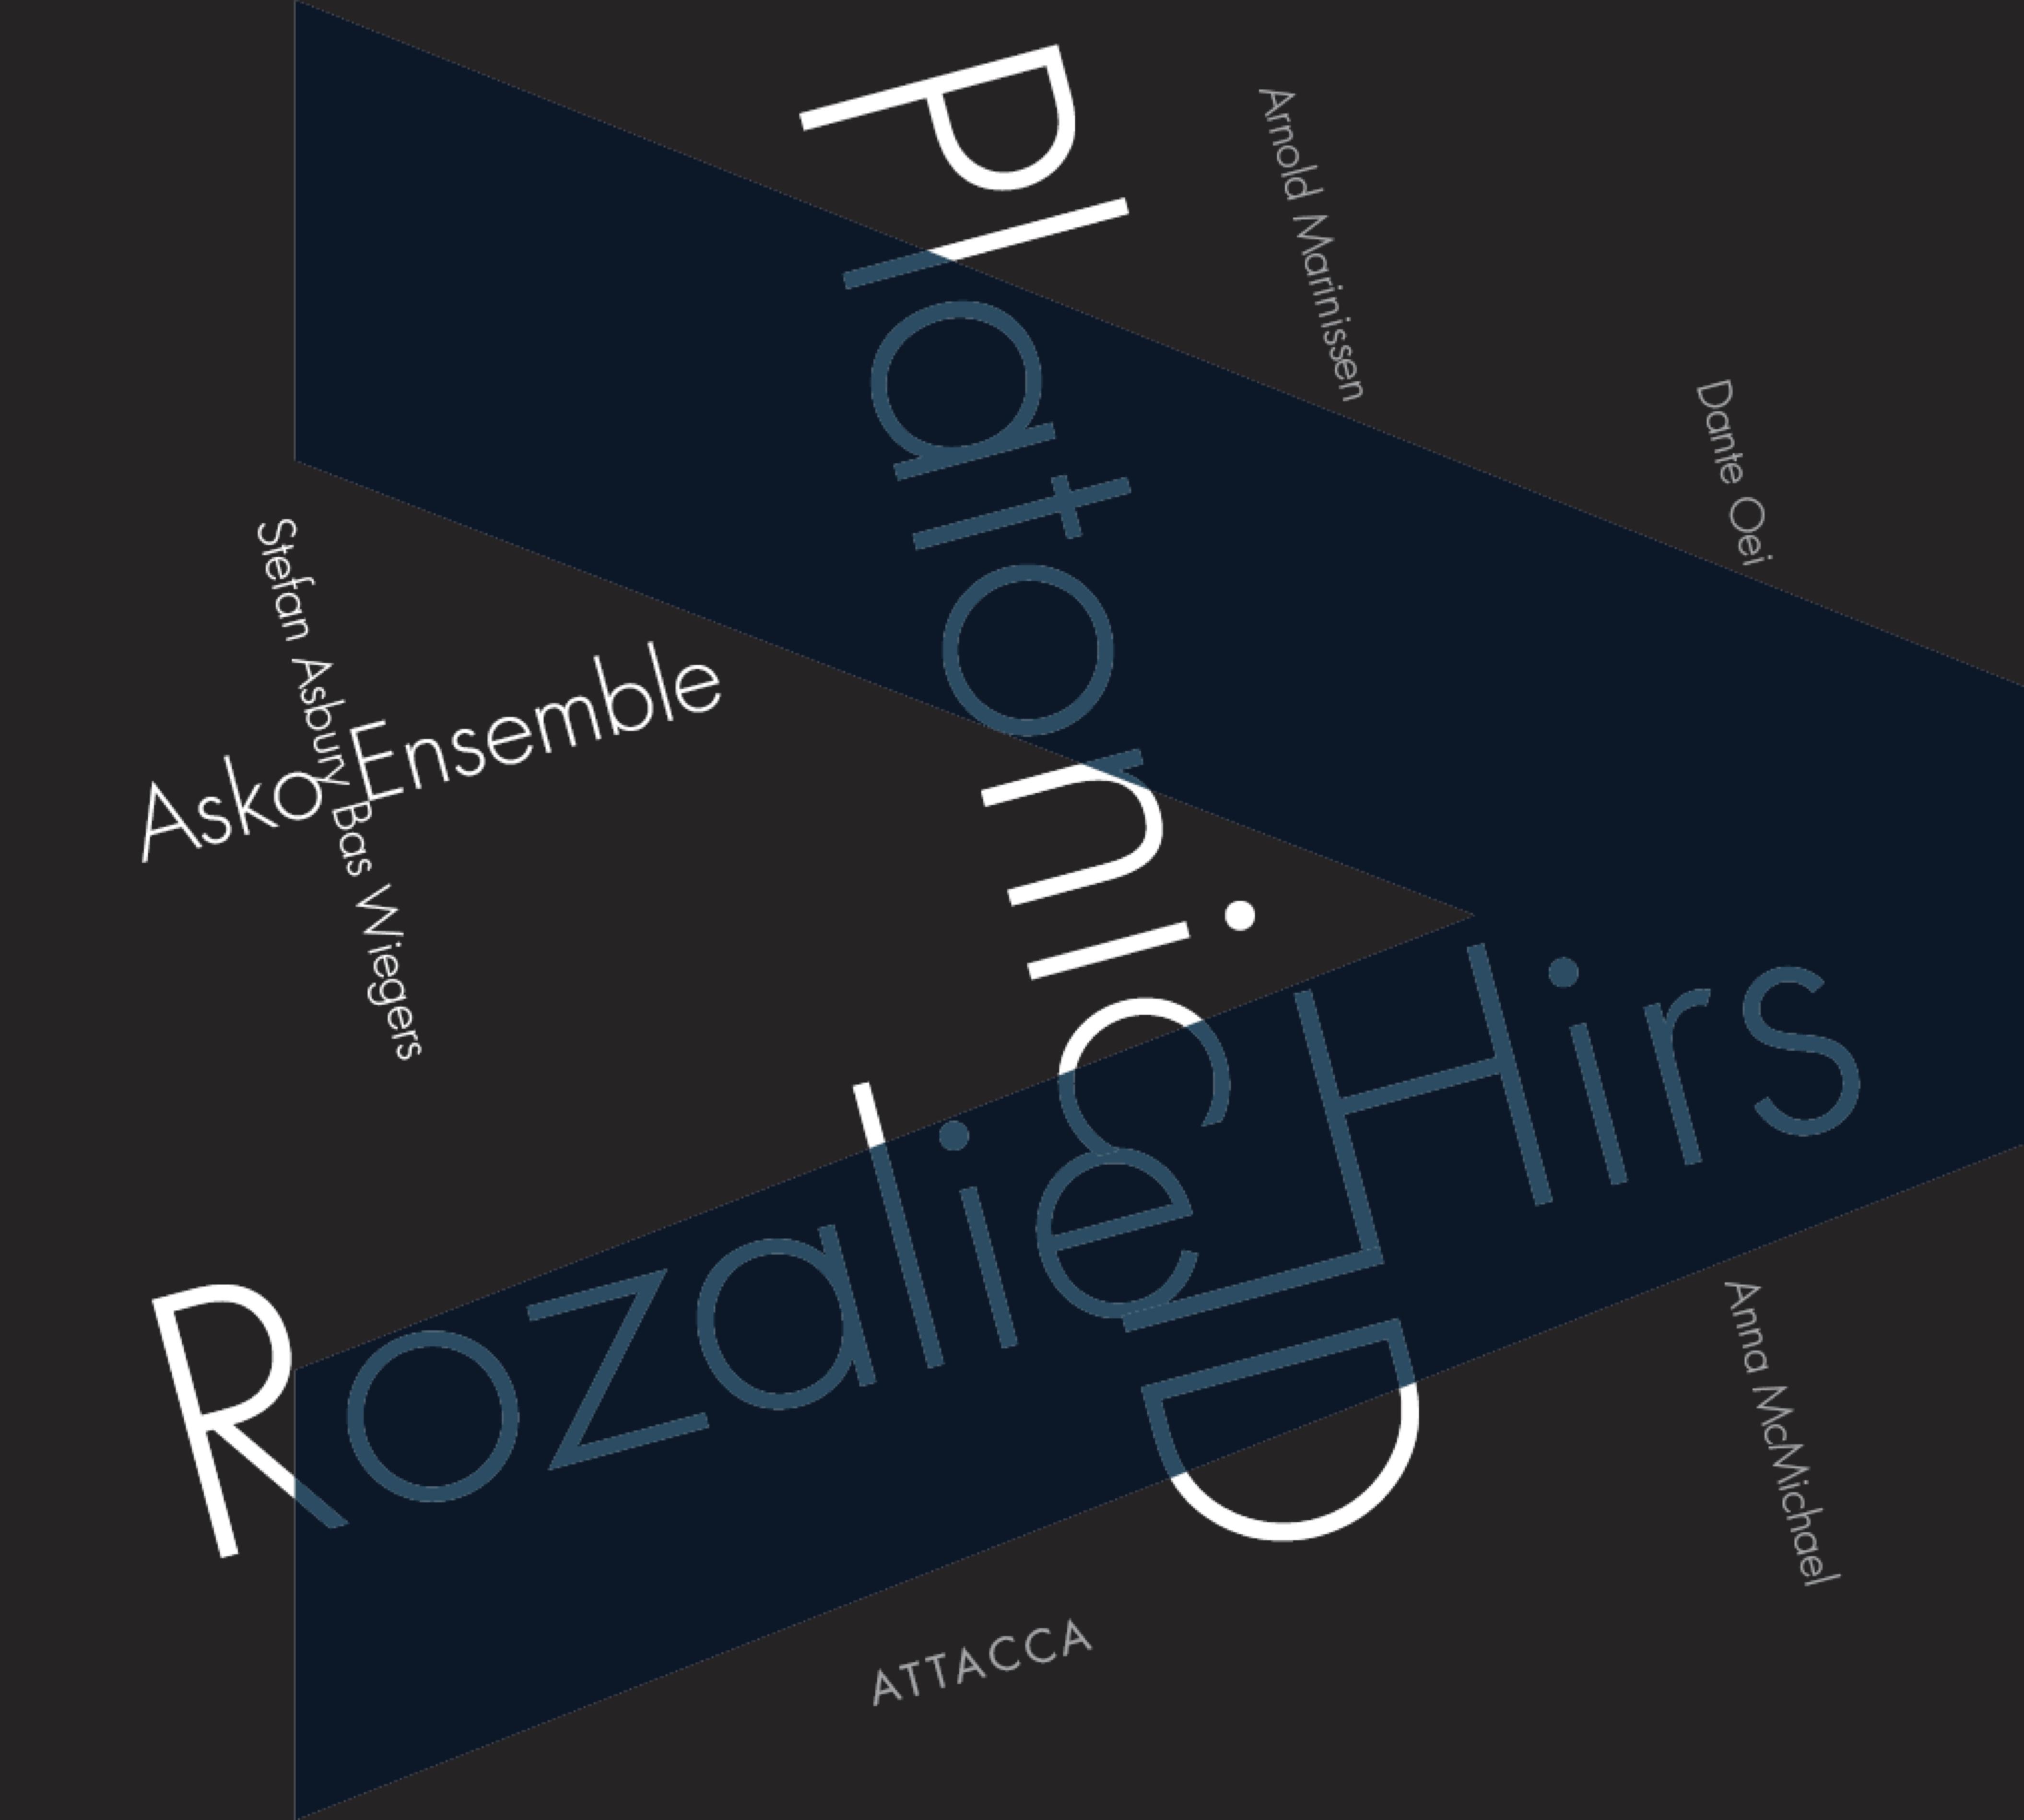 platonic id (2007) – portret cd rozalie hirs